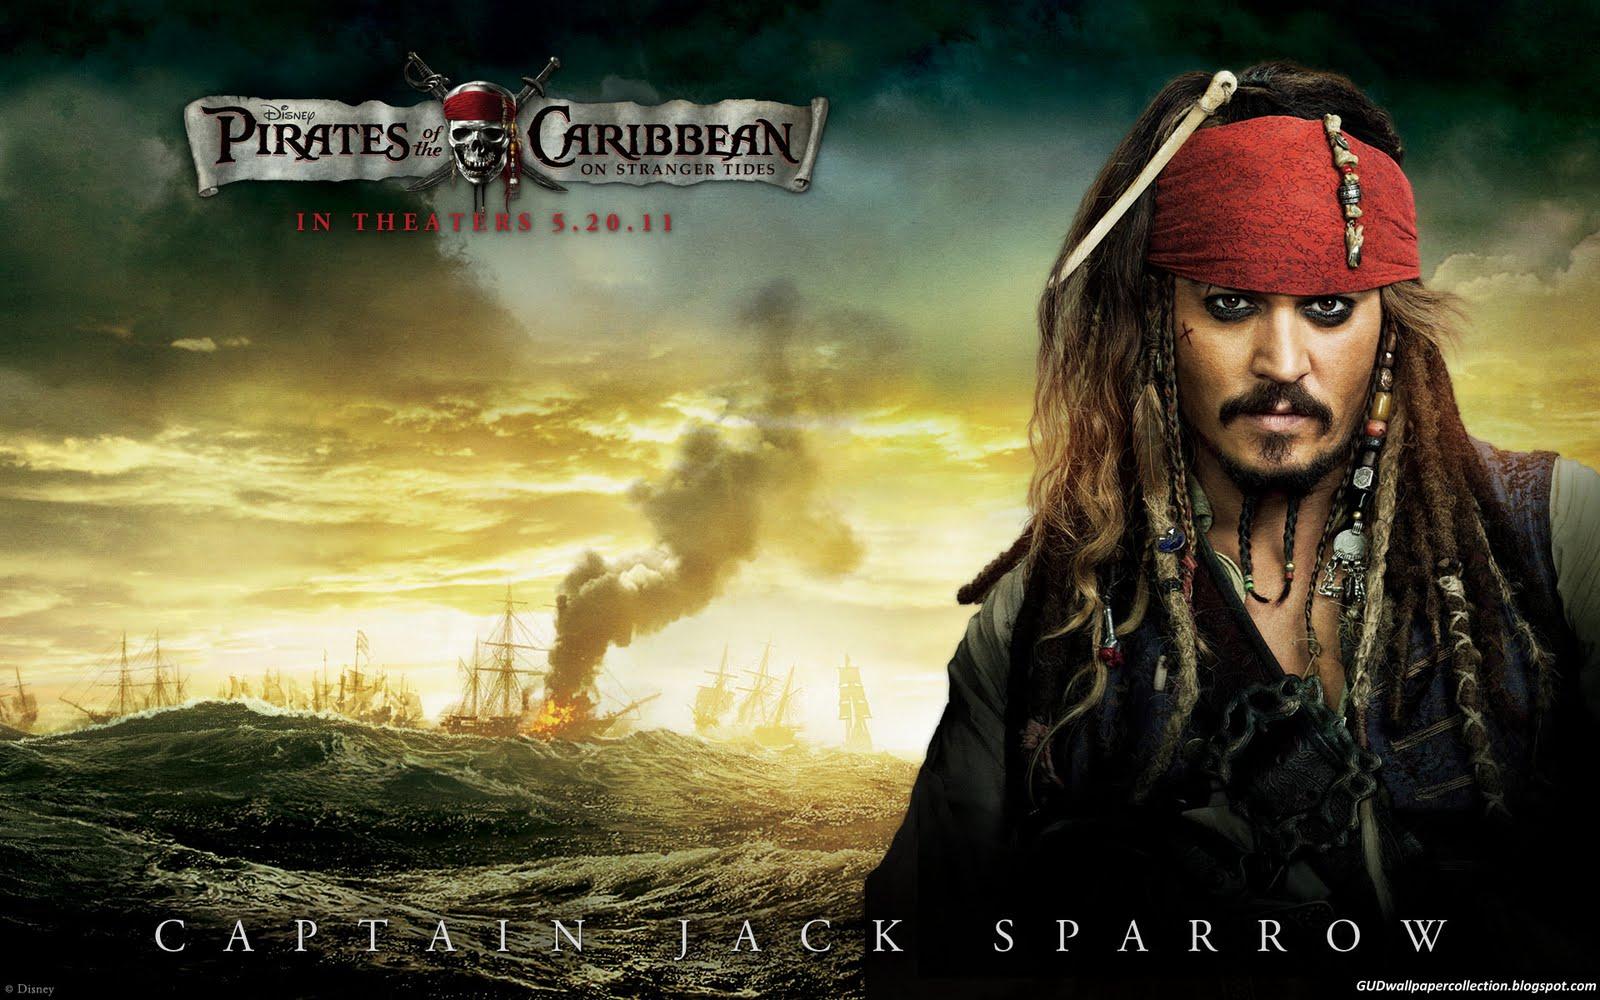 http://3.bp.blogspot.com/-Xd9KBTca--4/TdjdJ80AWvI/AAAAAAAAAcI/5faO7621pcM/s1600/johnny_depp_in_pirates_of_the_caribbean_4-wide.jpg